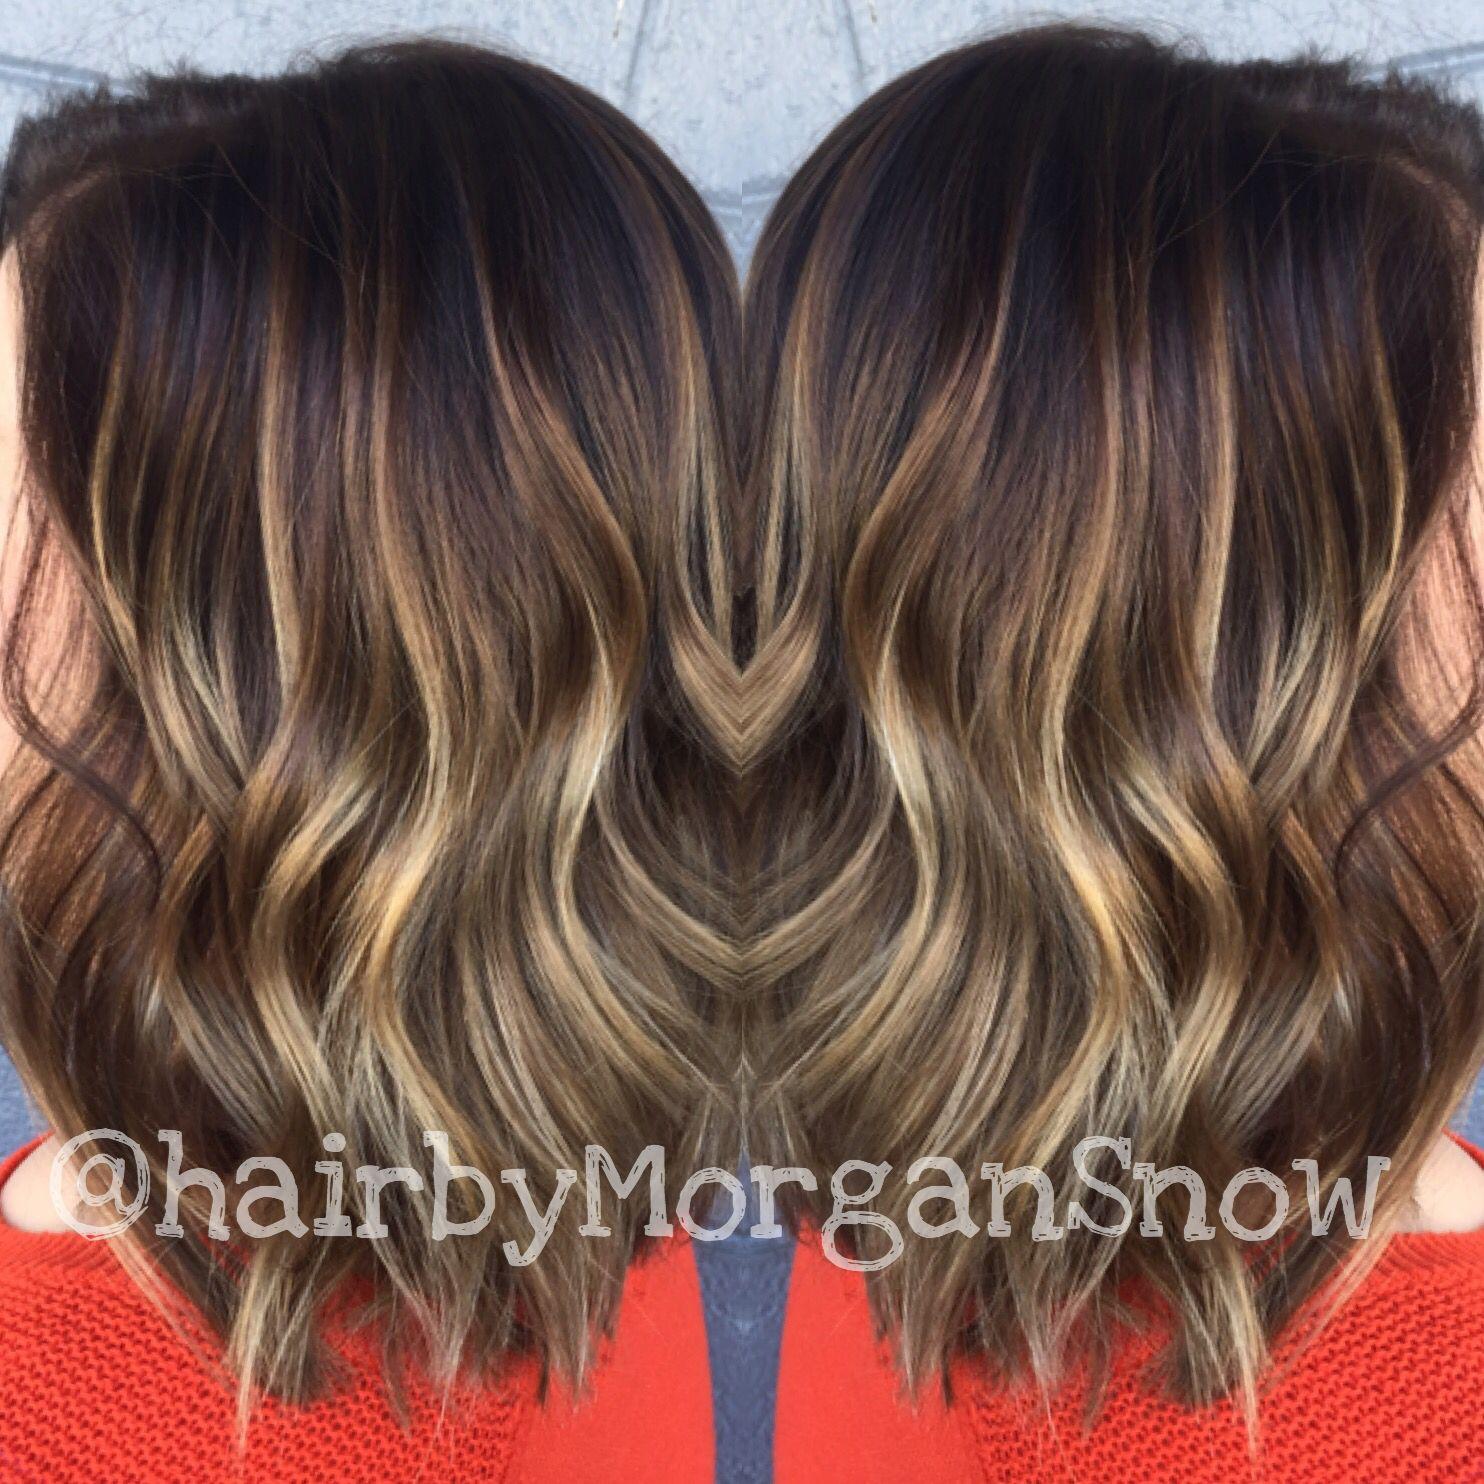 Dark to light blonde balayaged bob haircut. Hair painting. Shadow root.  Balayage.